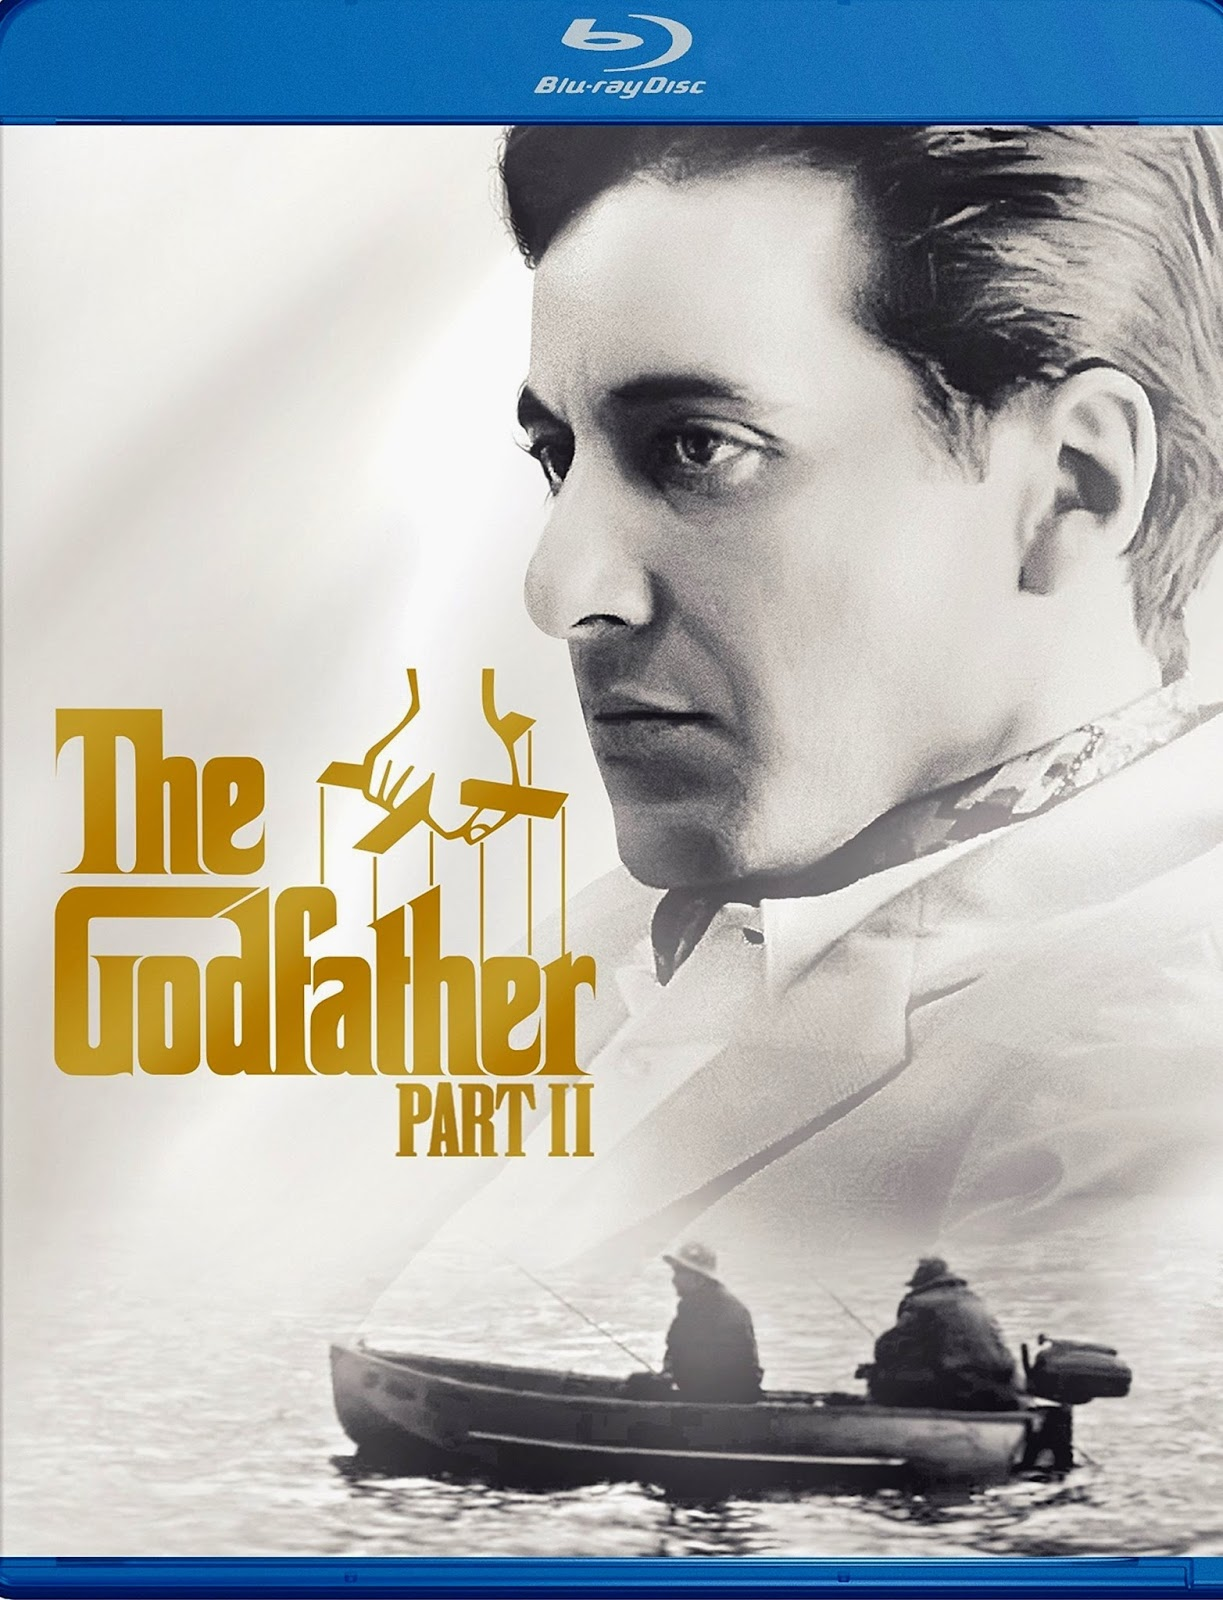 Godfather bluray - Lipo control